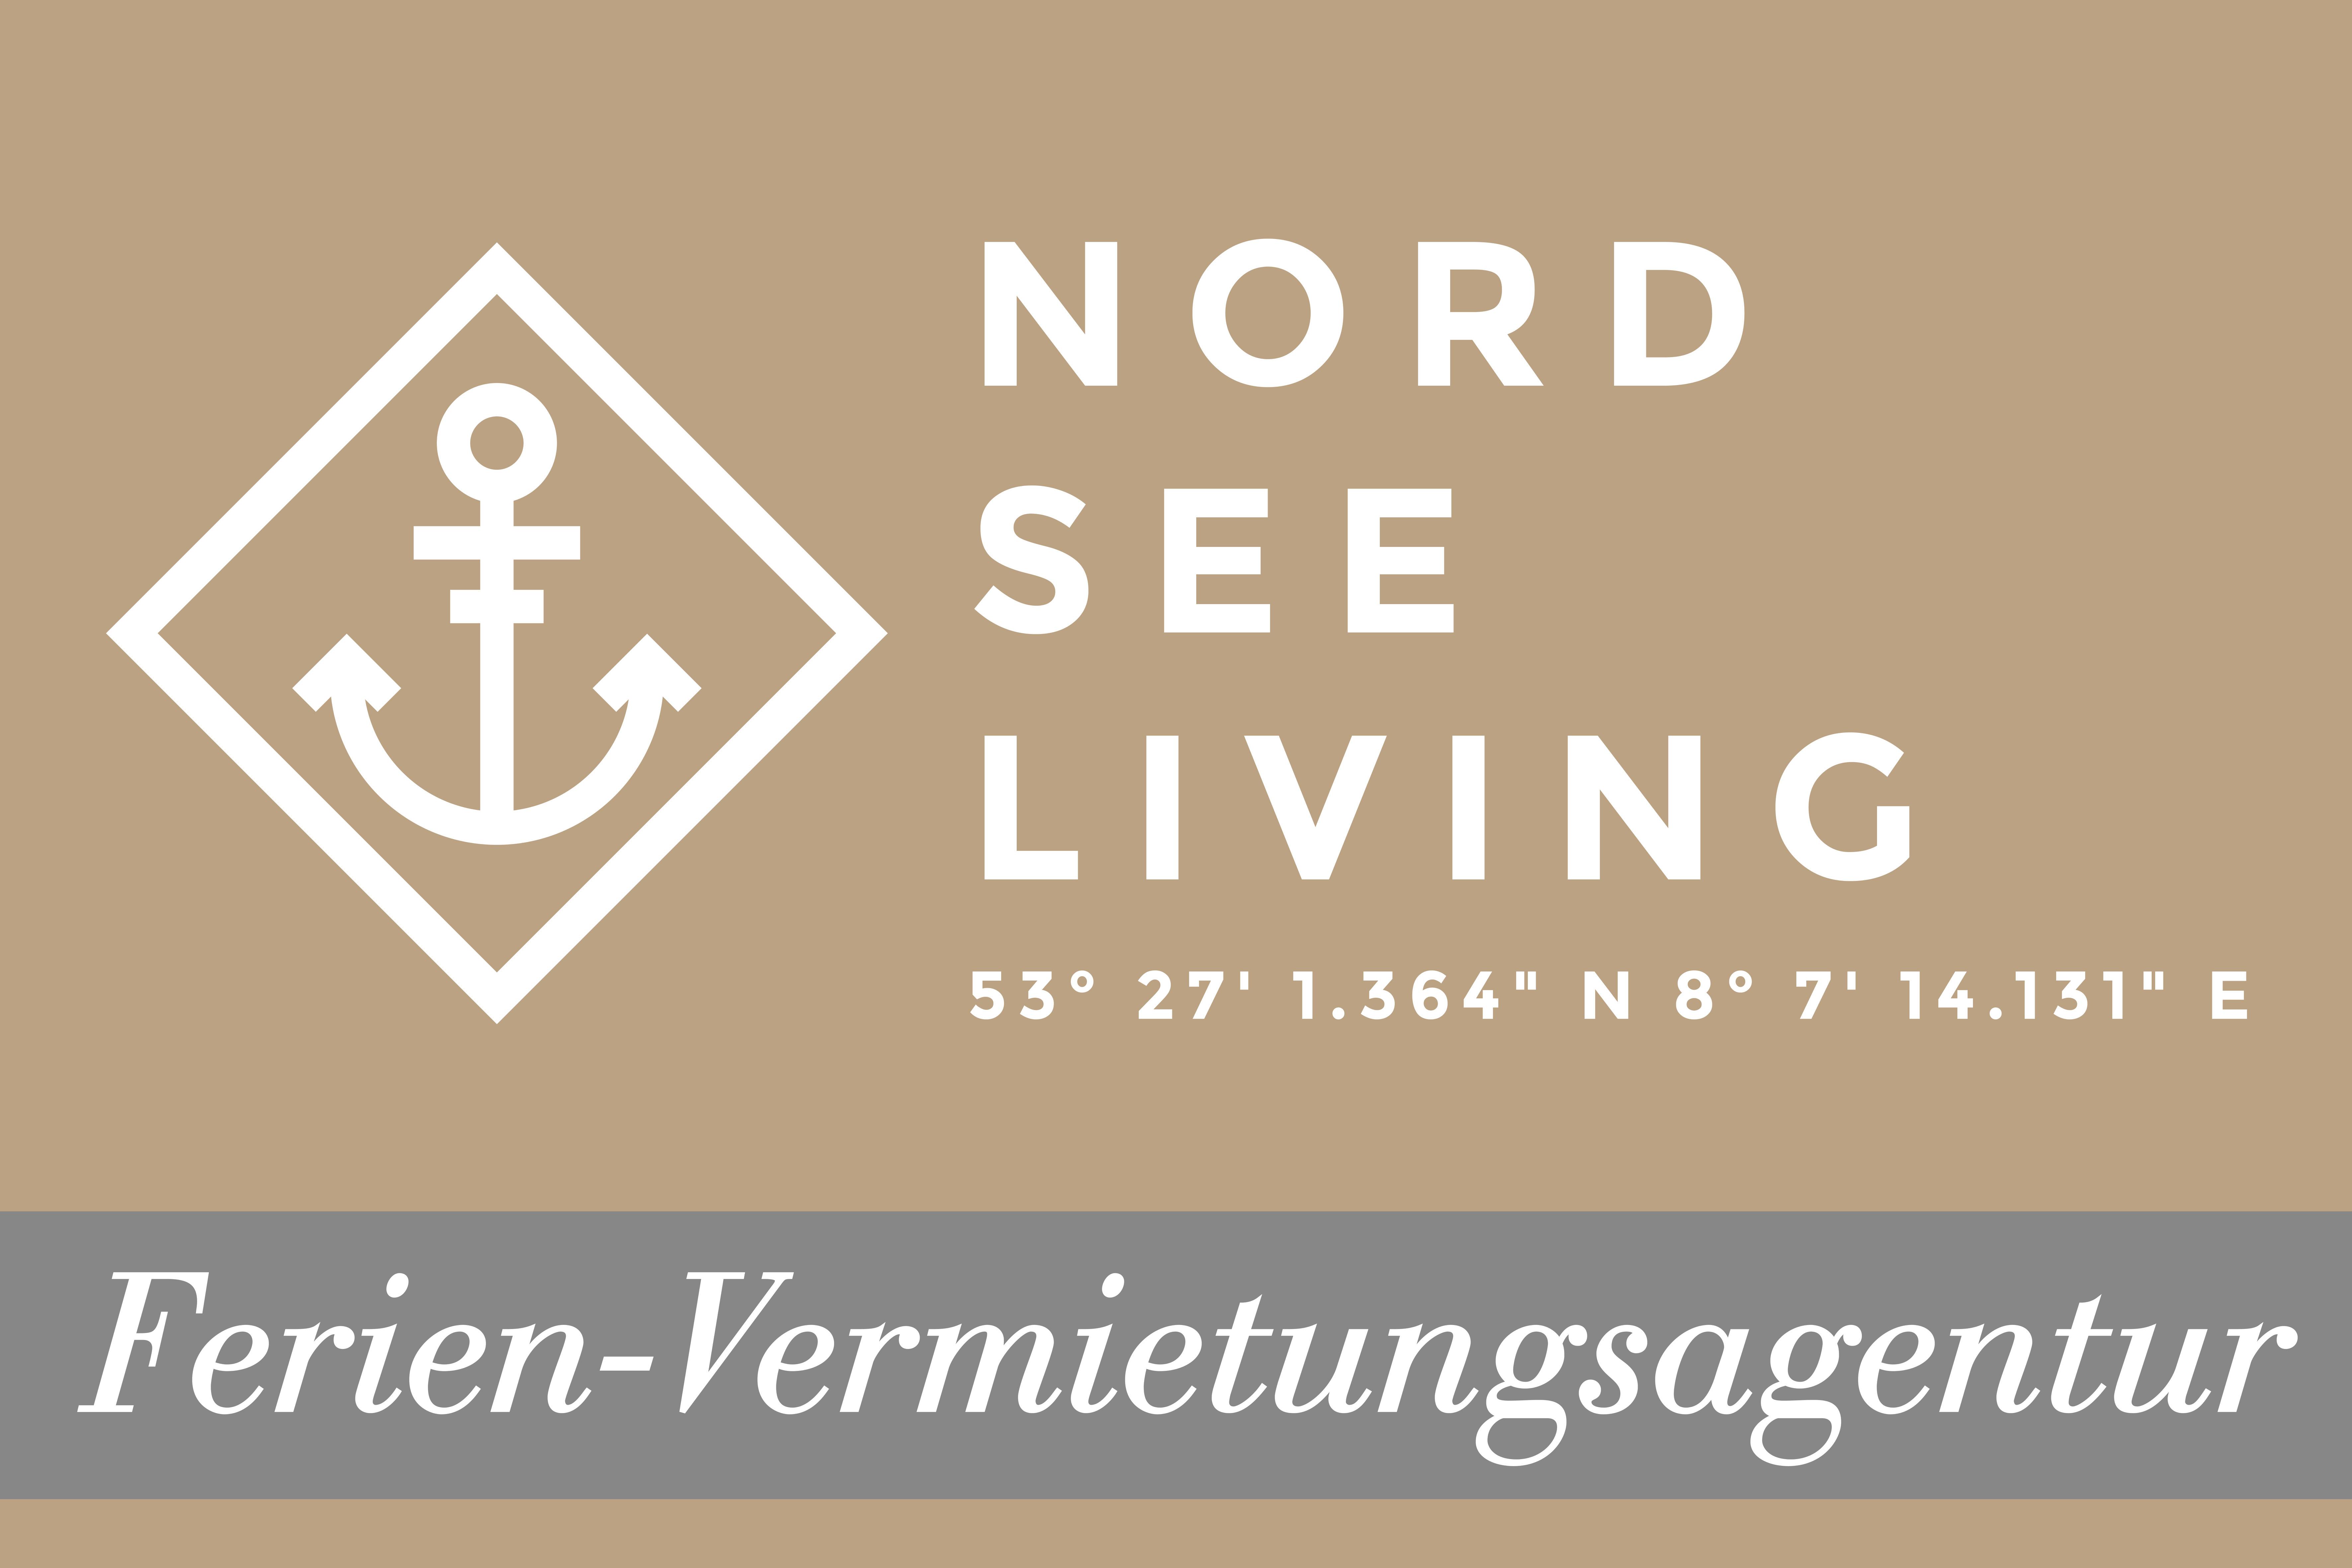 Nordseeliving